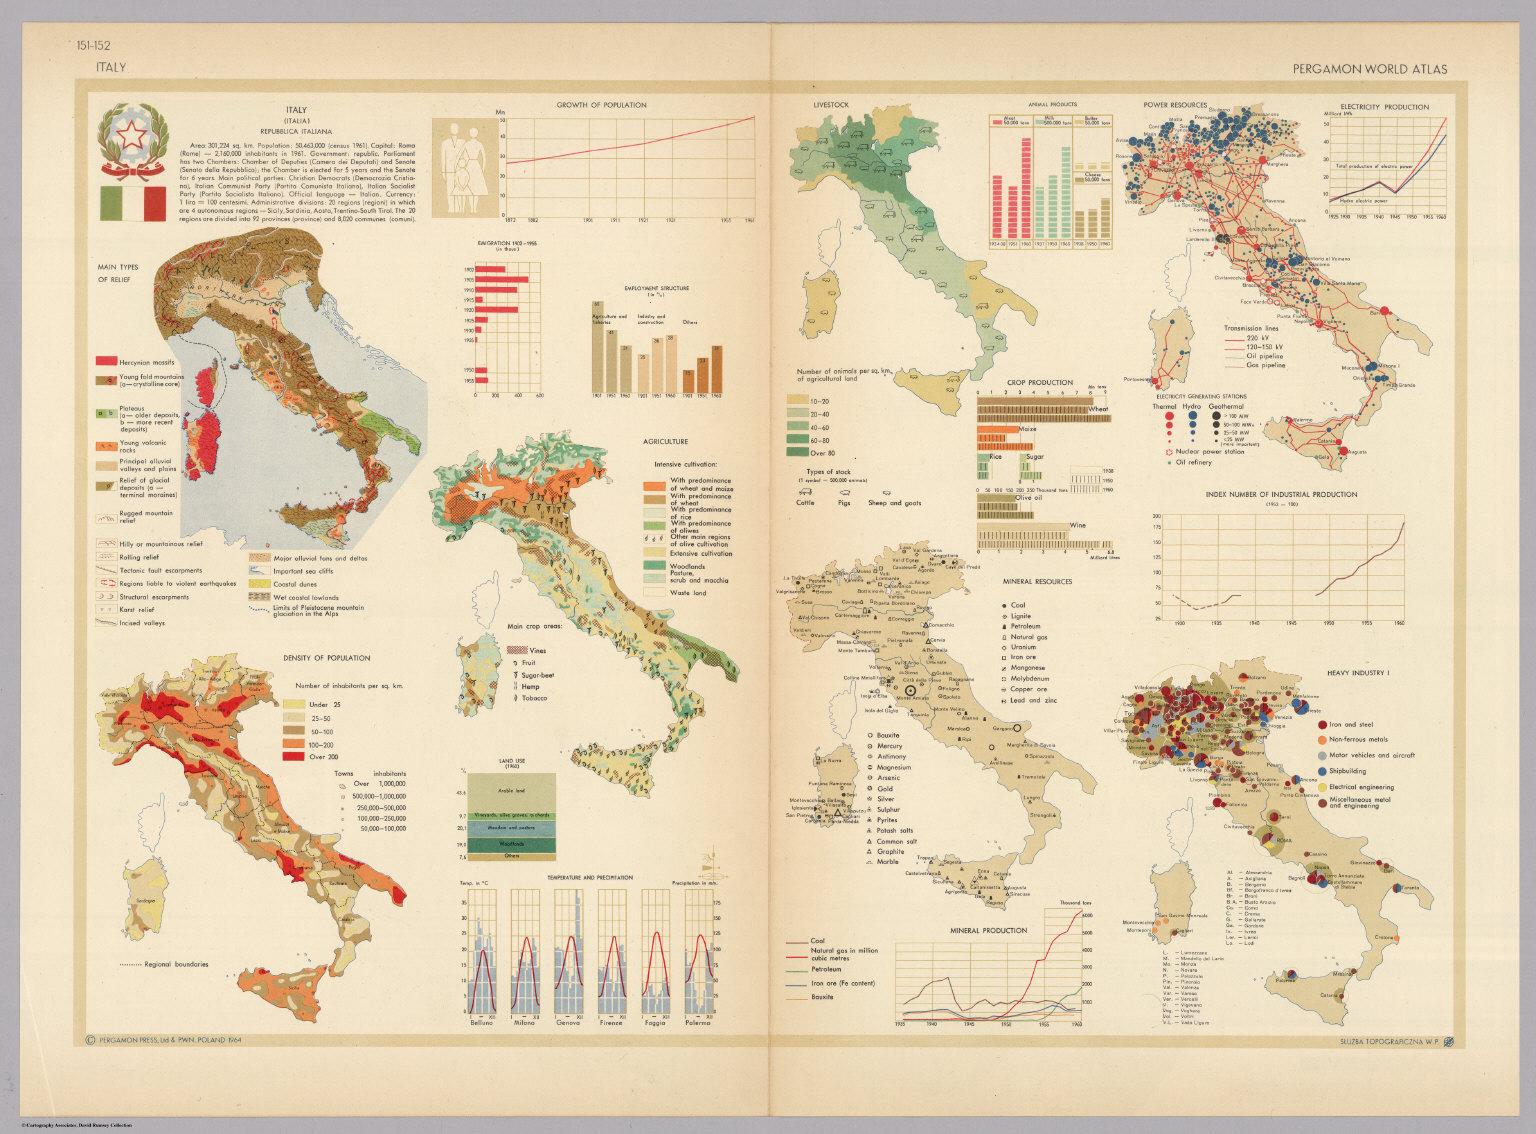 Italy pergamon world atlas david rumsey historical map collection italy pergamon world atlas gumiabroncs Choice Image